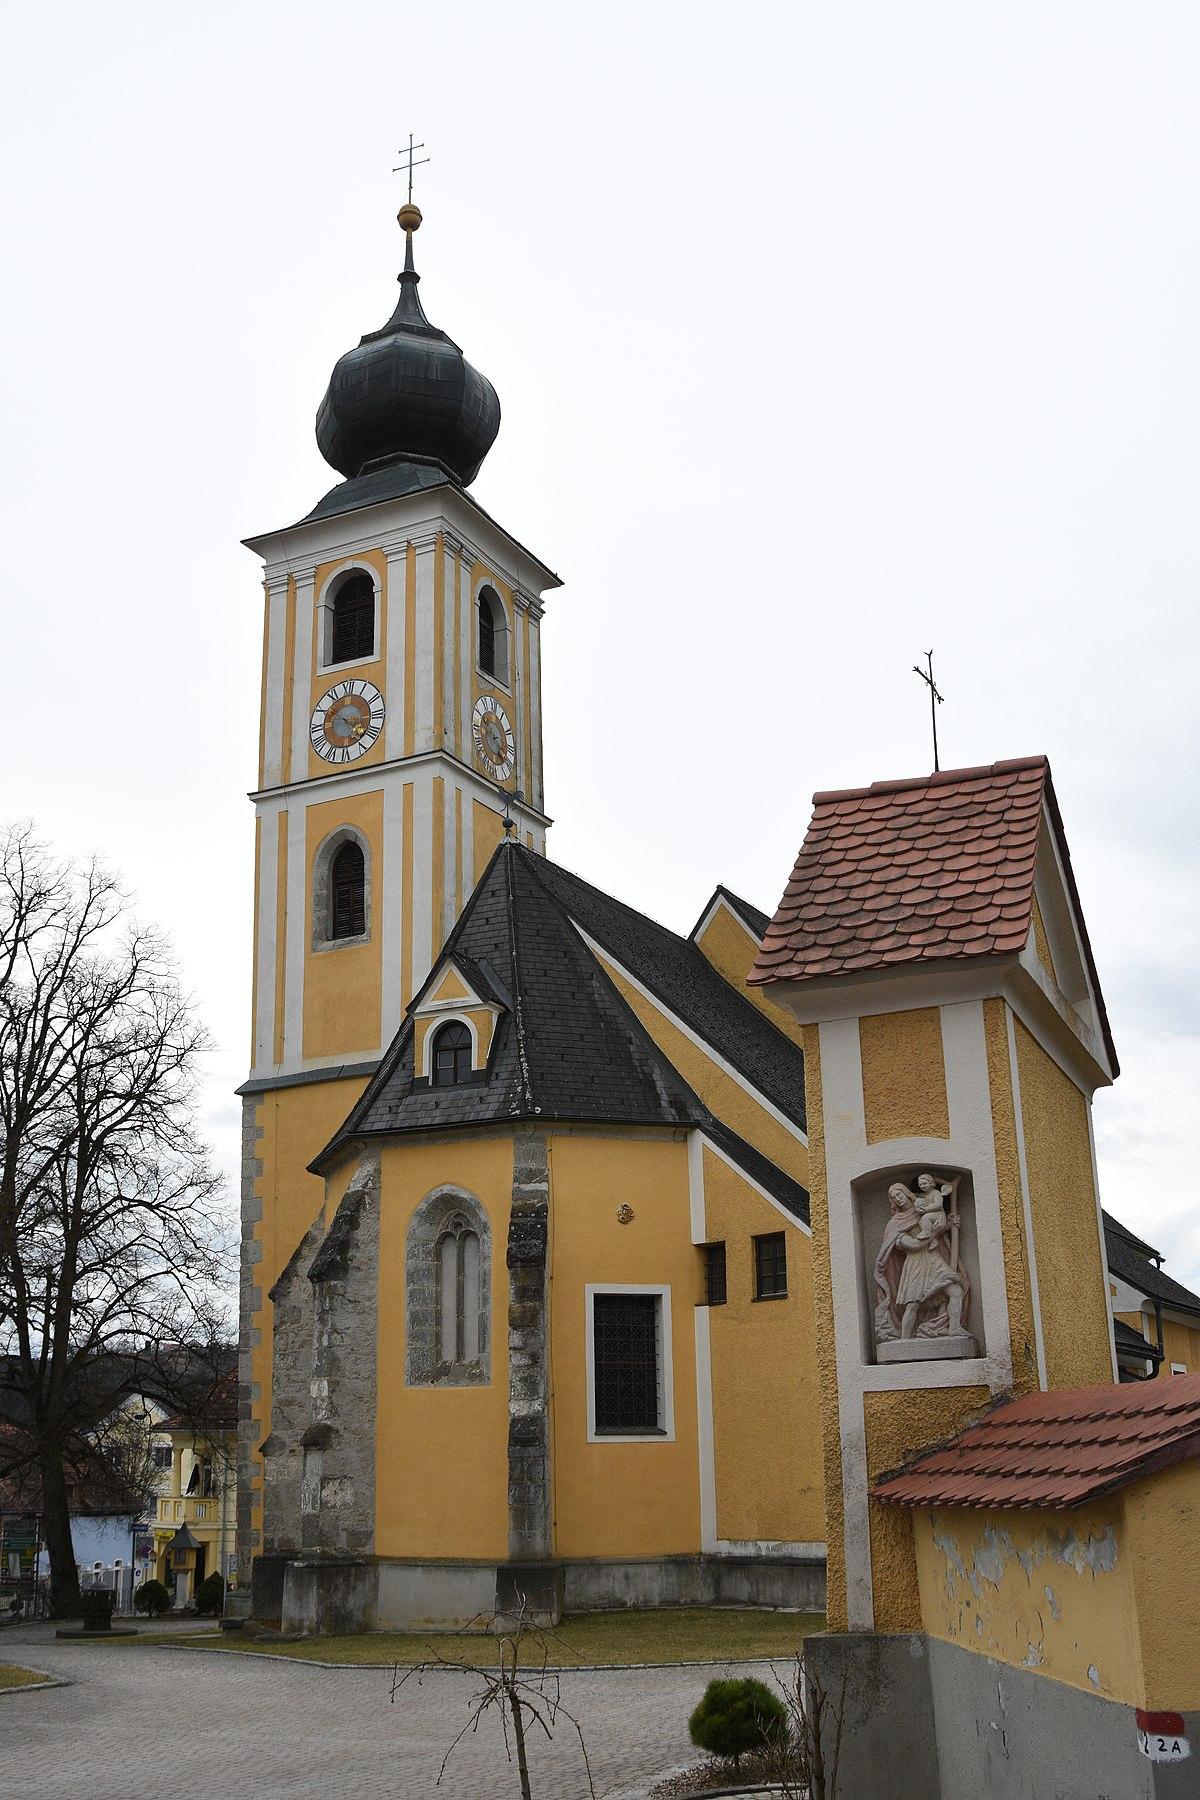 Markt hartmannsdorf single lokale - Trumau dating service